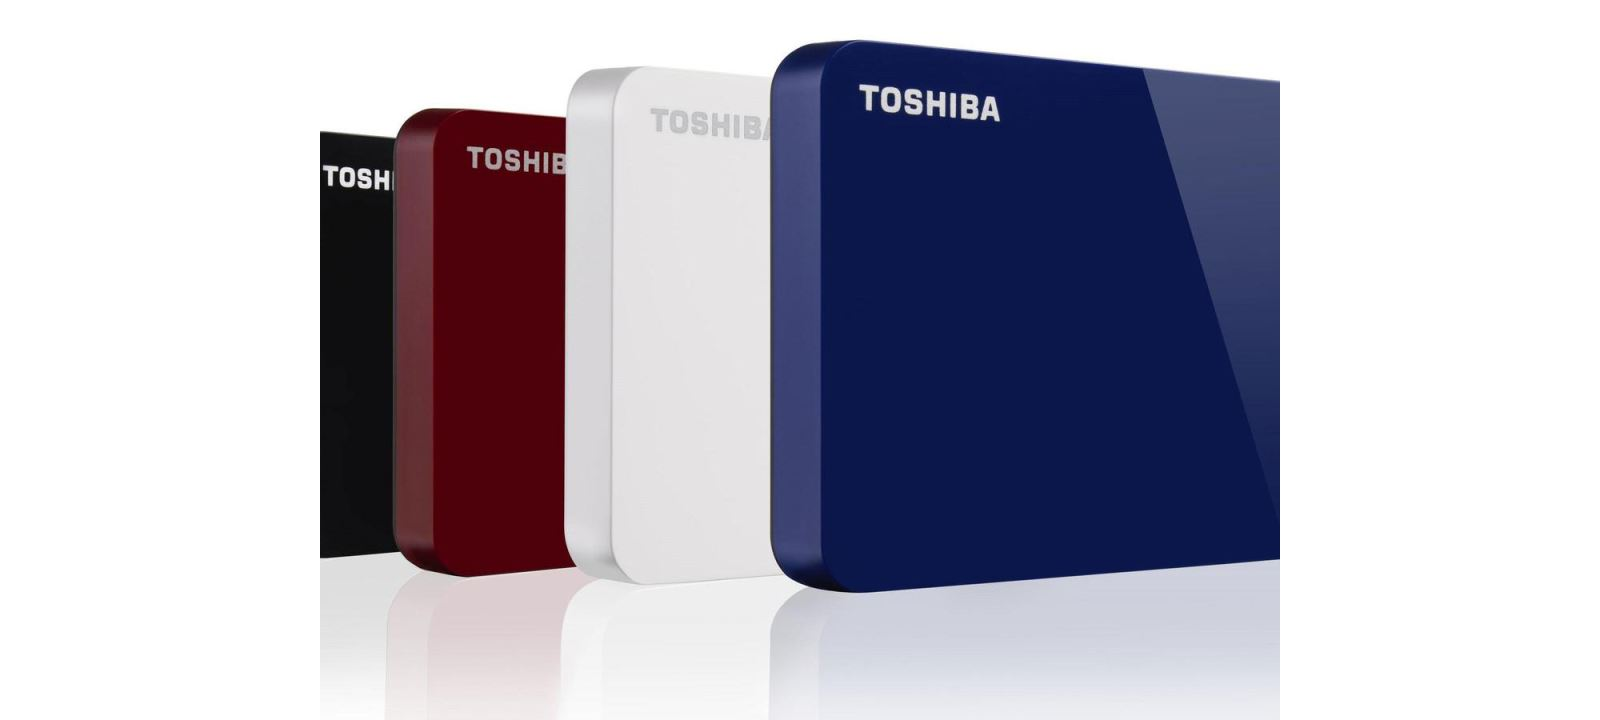 ps4 external hard drive amazon